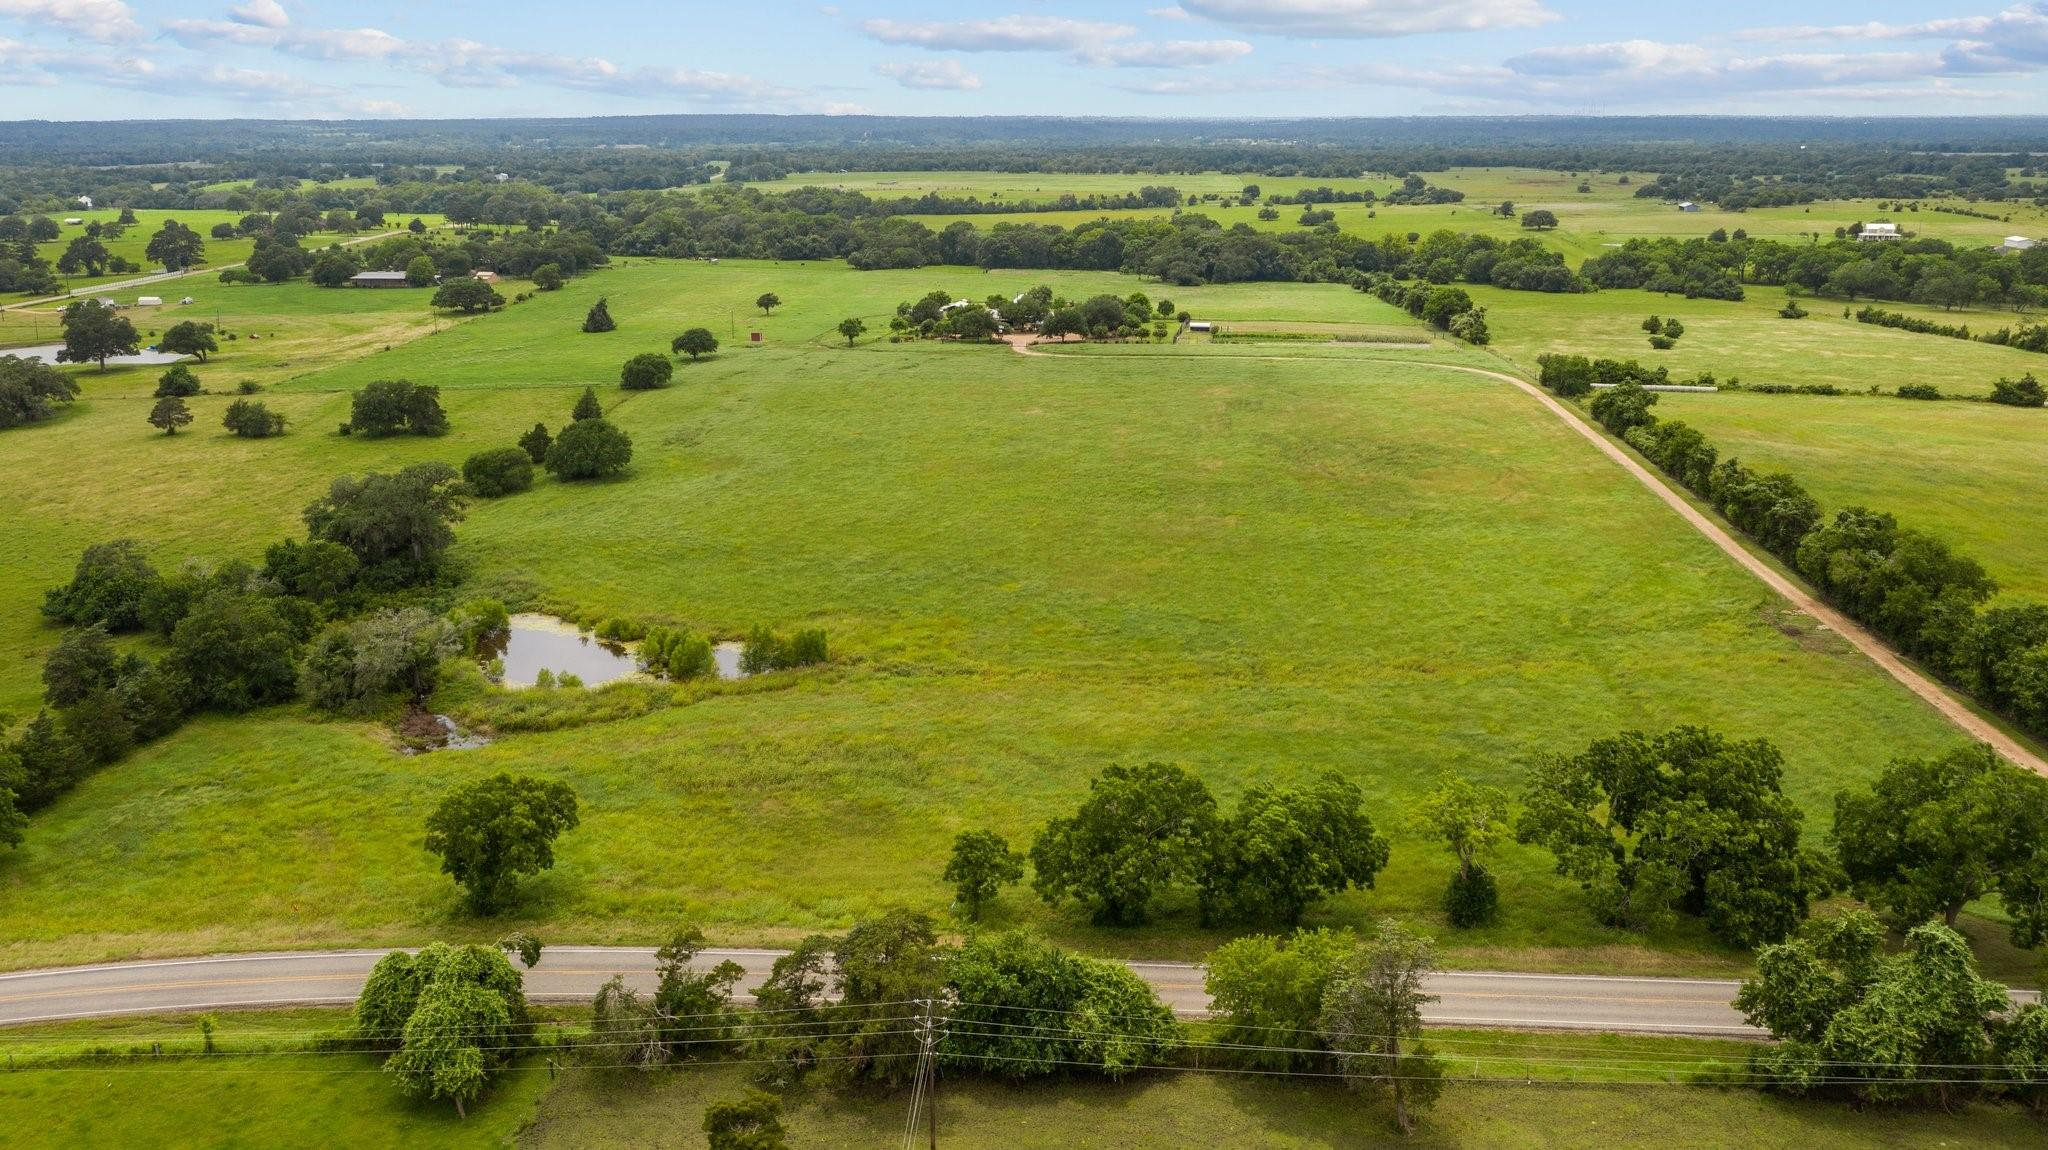 000 Fm 1291 Property Photo